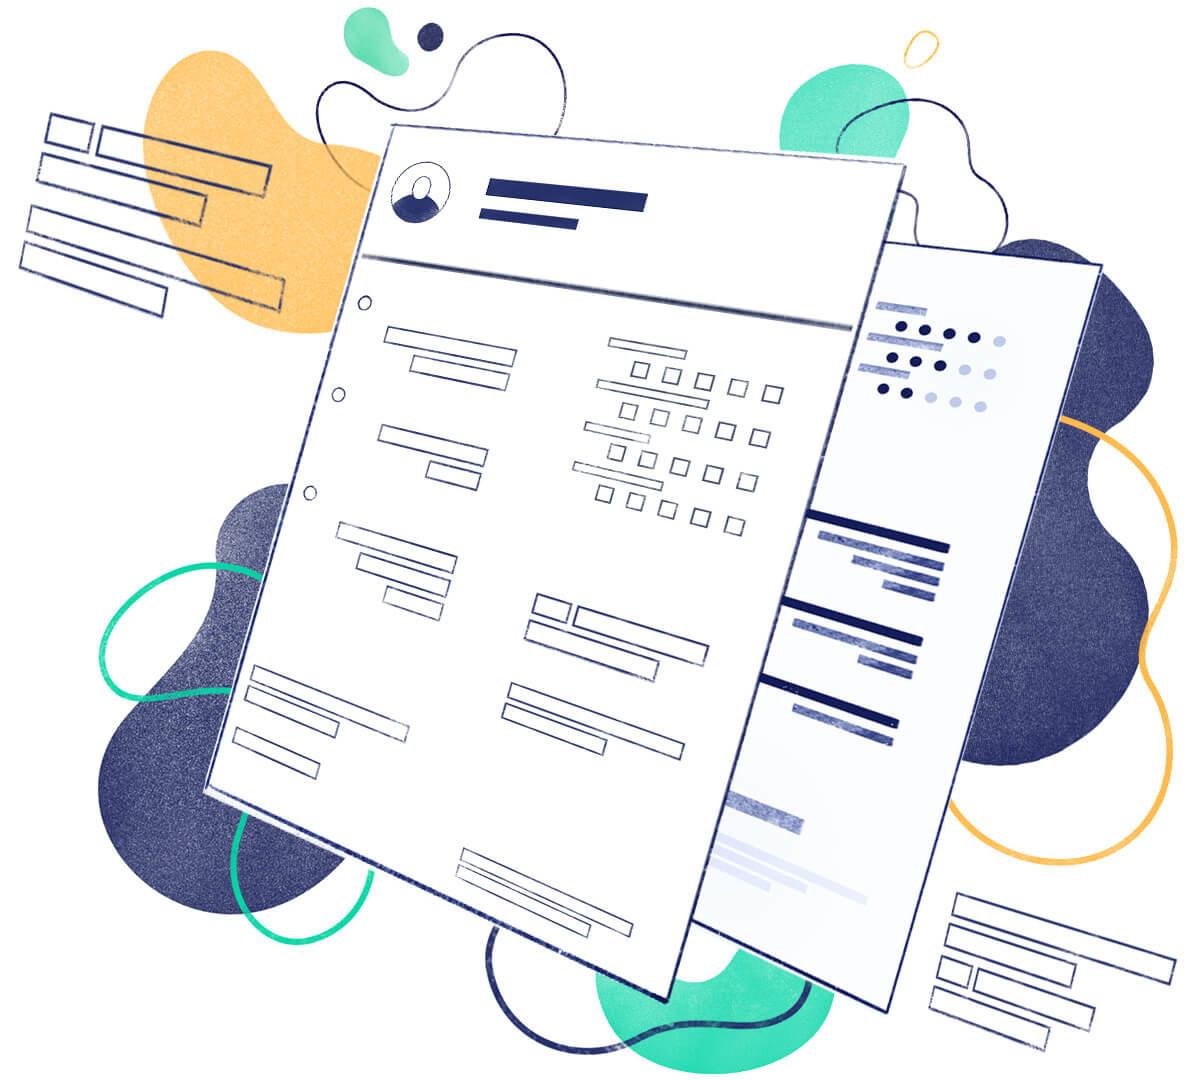 Preschool Teacher CV Sample—20+ Examples and Expert Tips